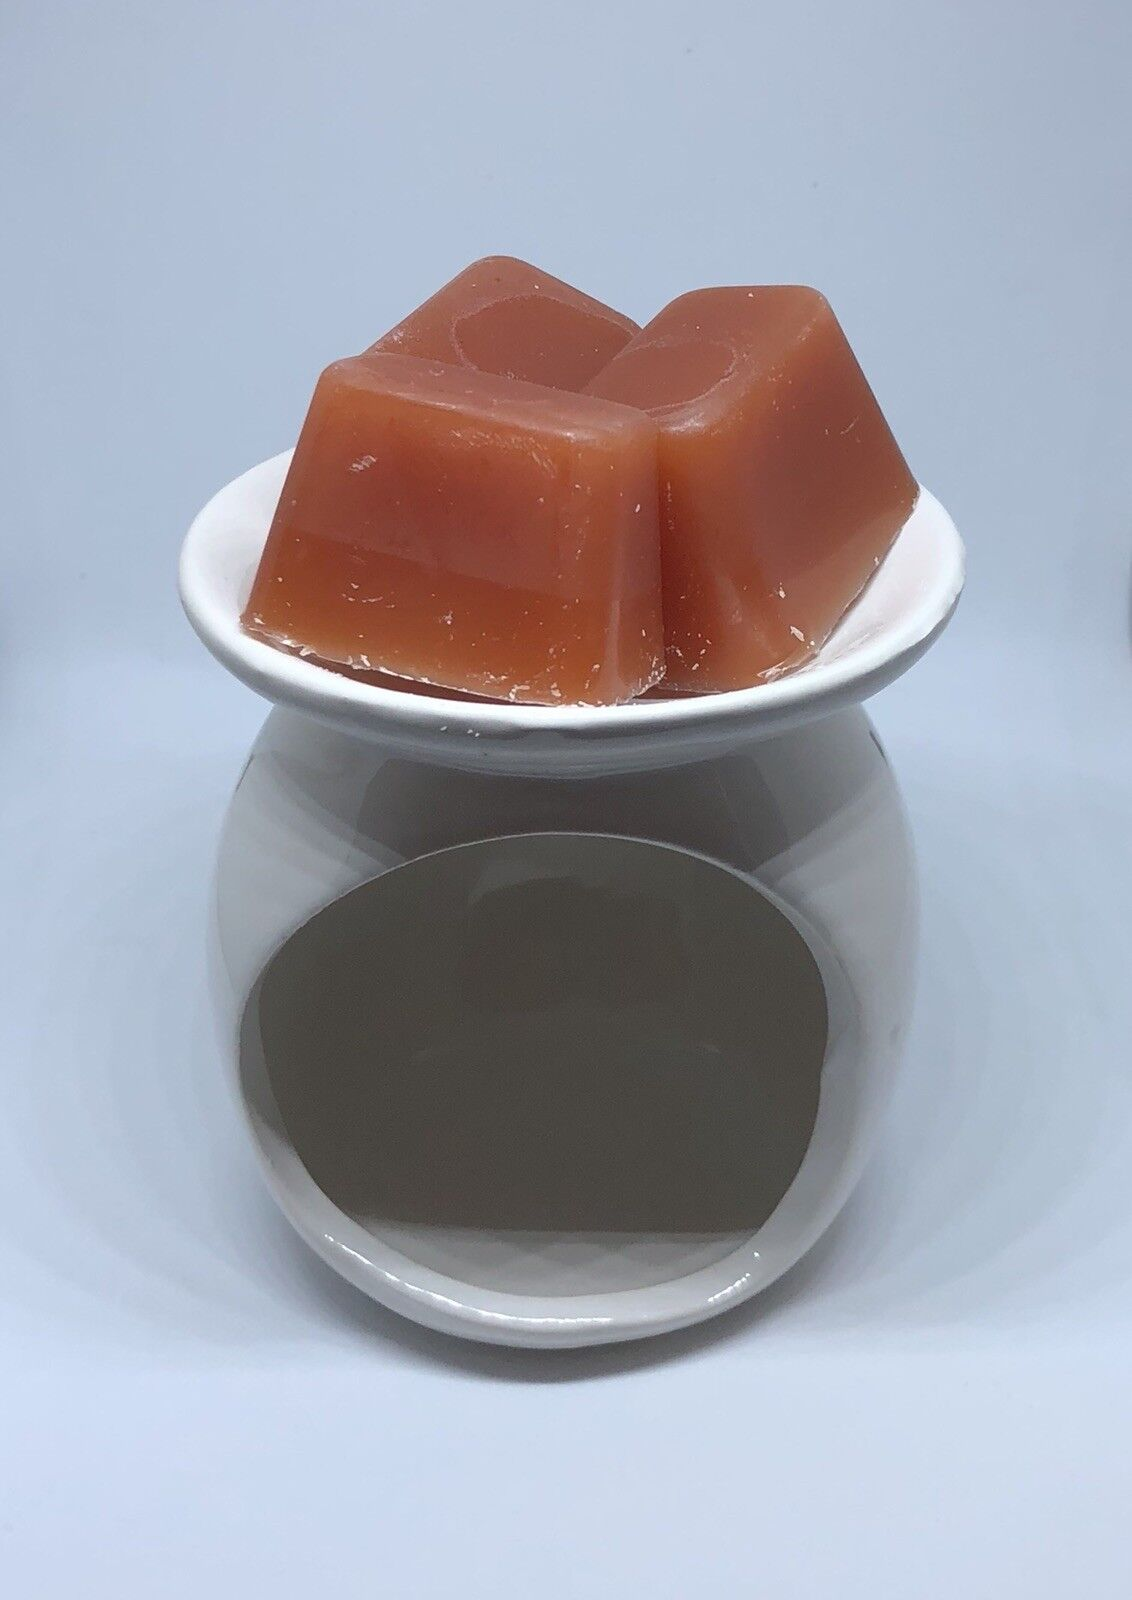 Ceramic Candle Holder Wax Melt Warmer with 3 pcs Apple Cinna